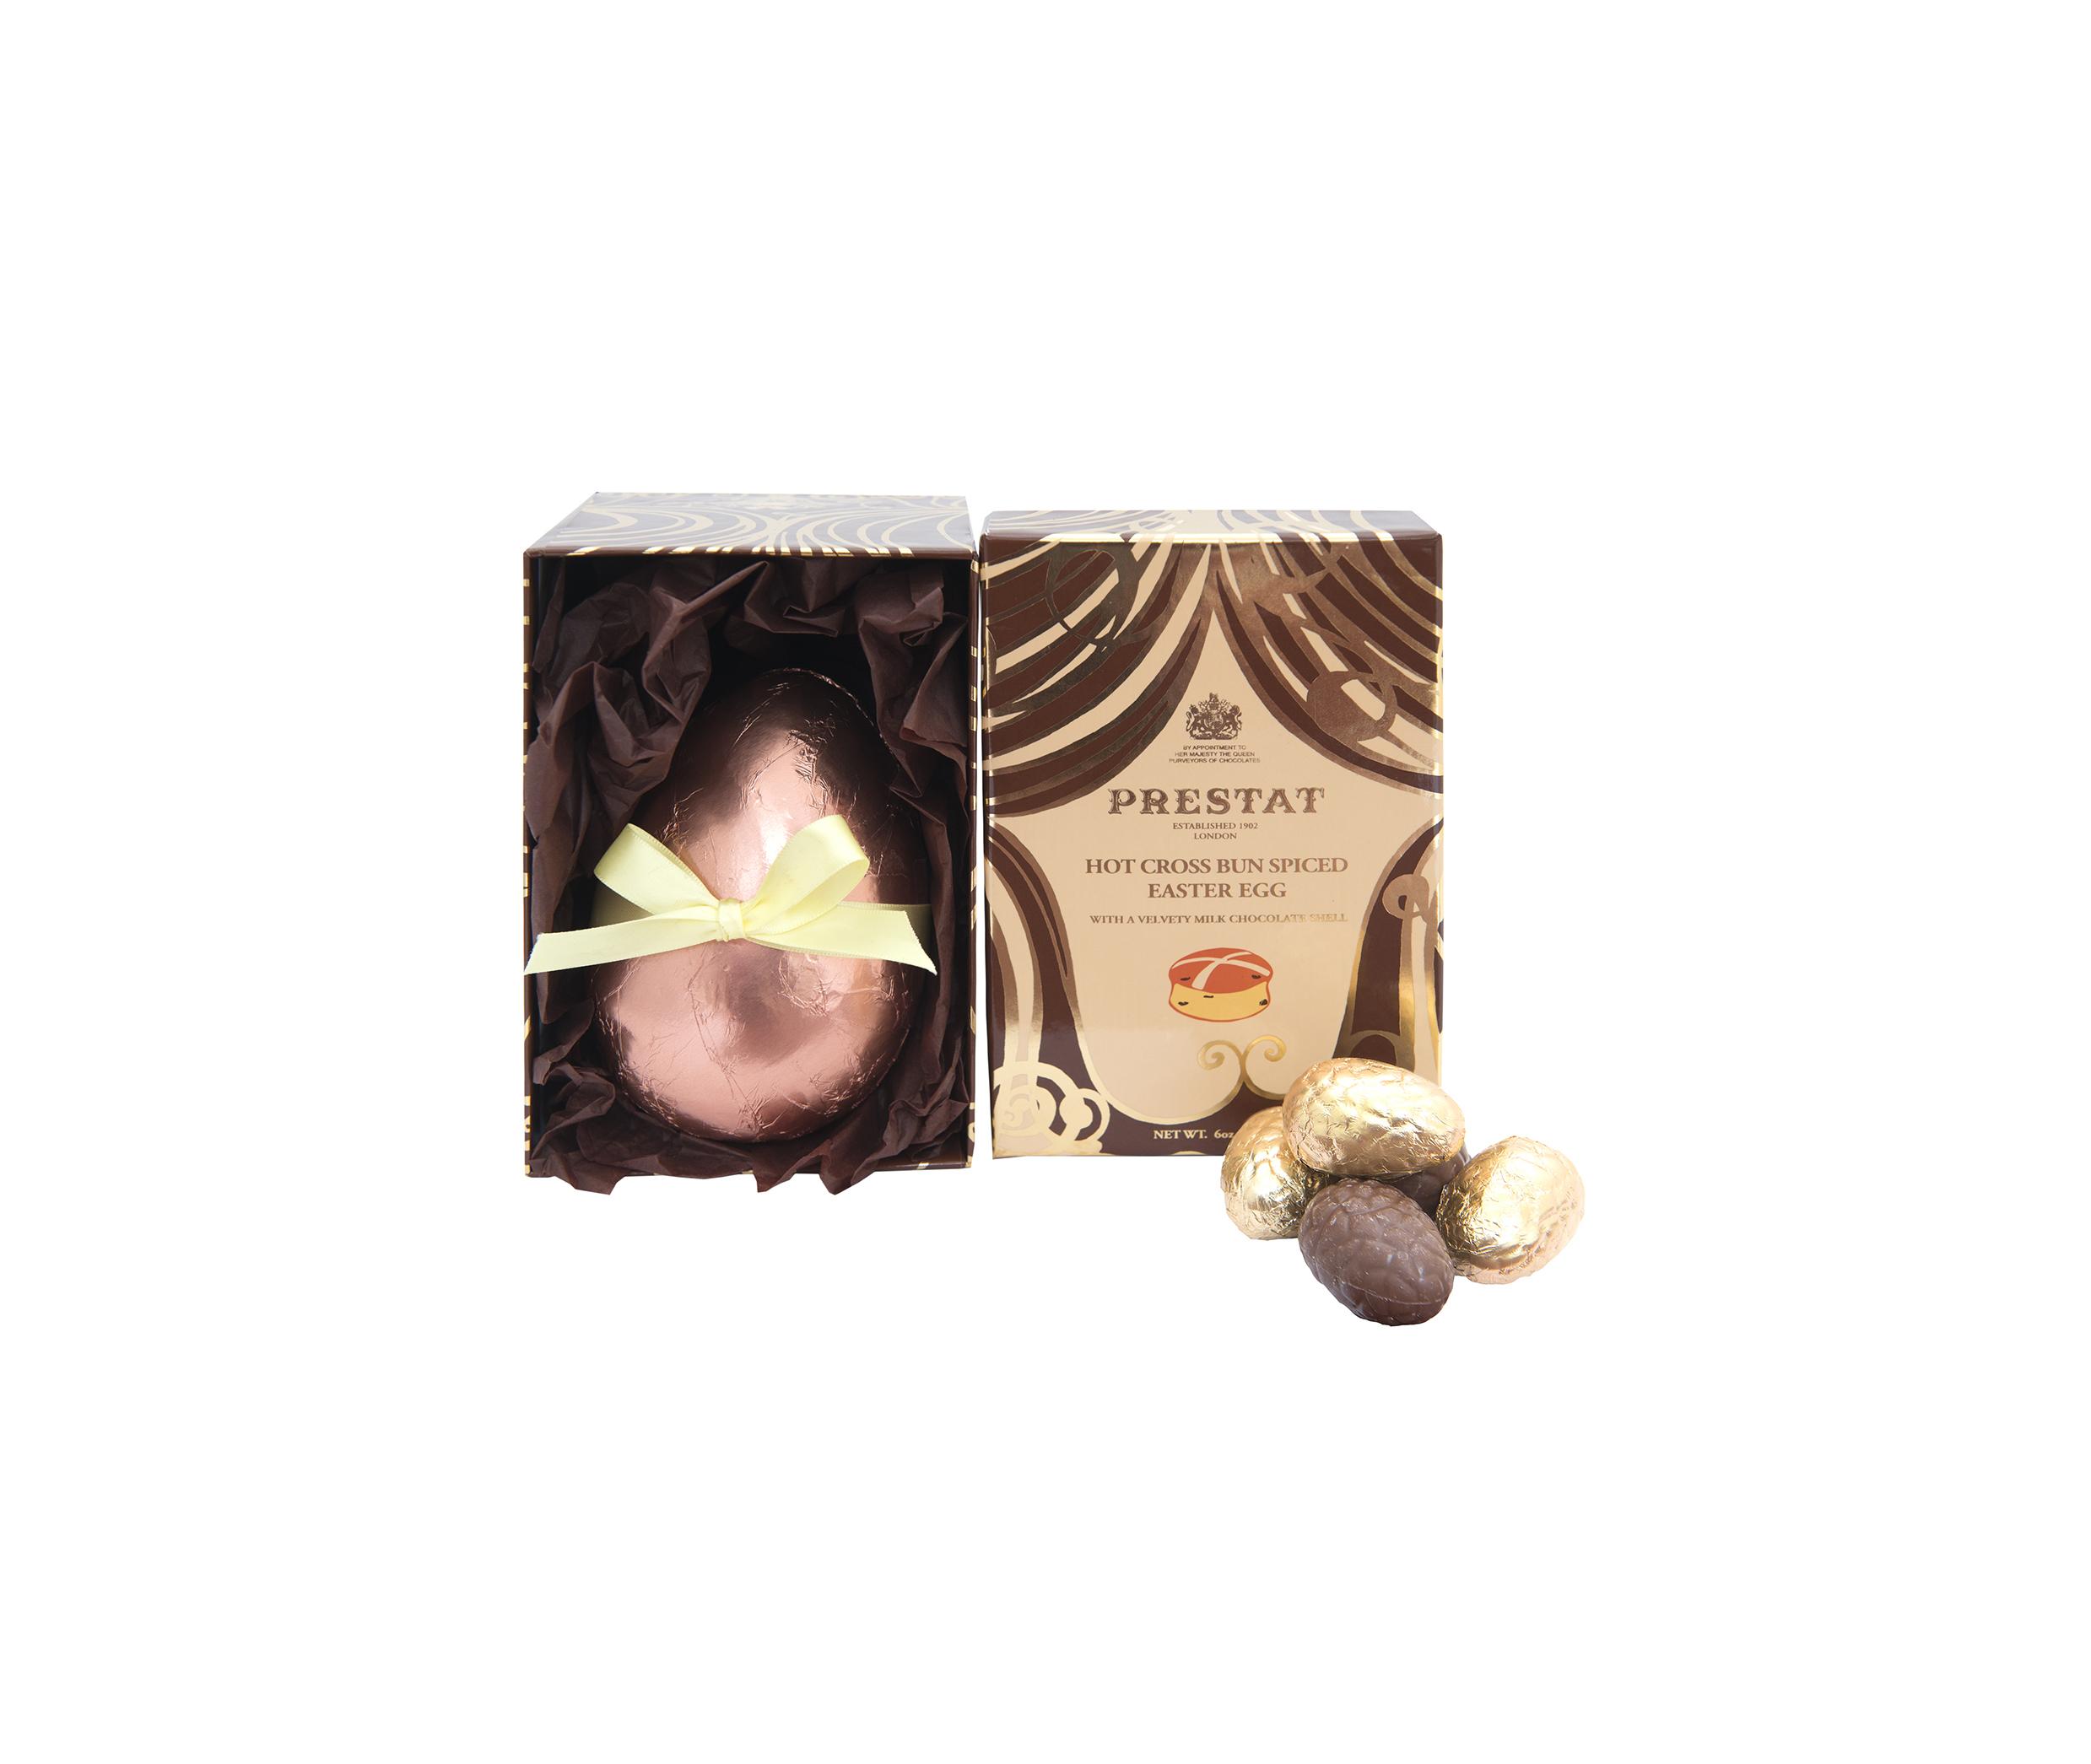 pMilk Chocolate Hot Cross Bun Spiced Easter Egg £17.50 - Prestat (2)